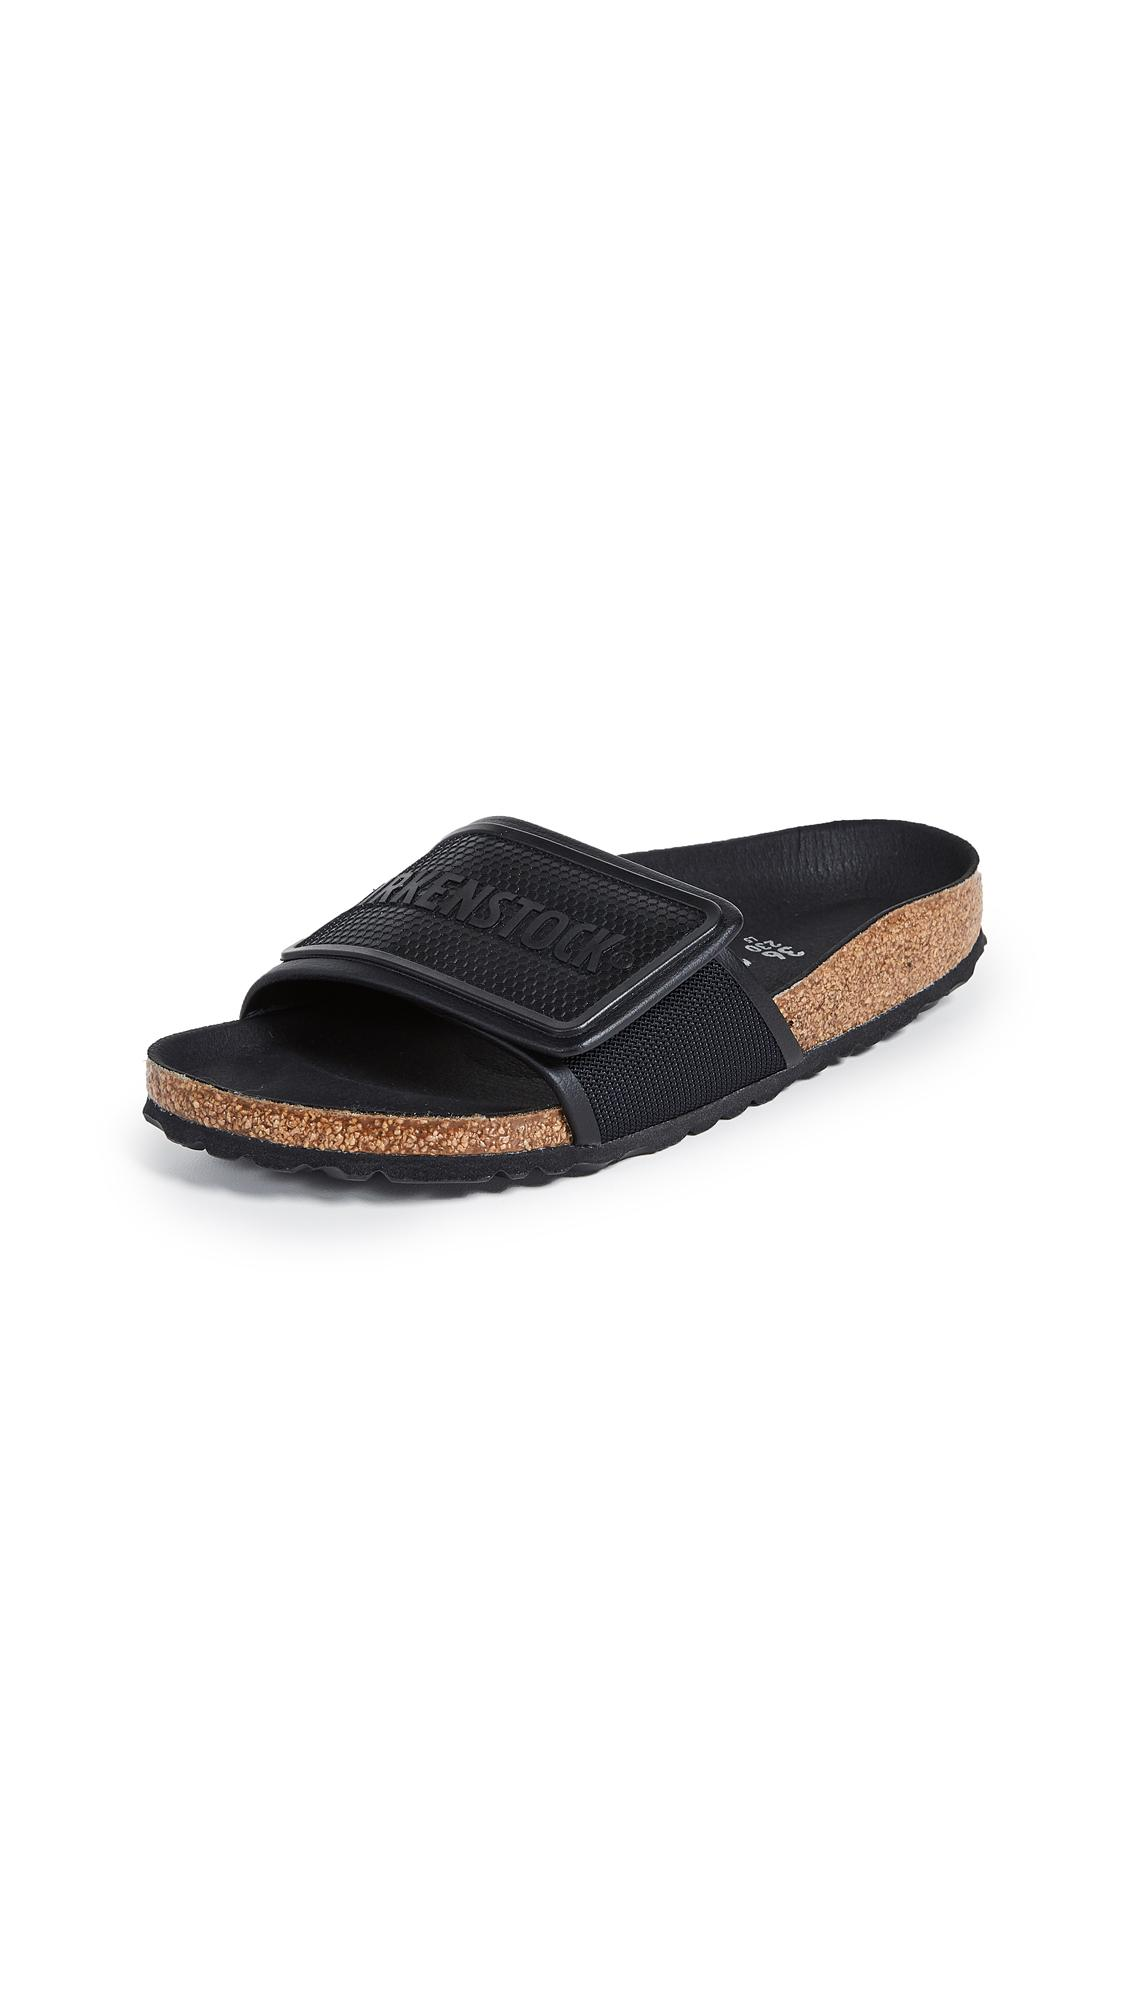 fc1a8e31ac0 Birkenstock - Black Tema Sandals - Lyst. View fullscreen